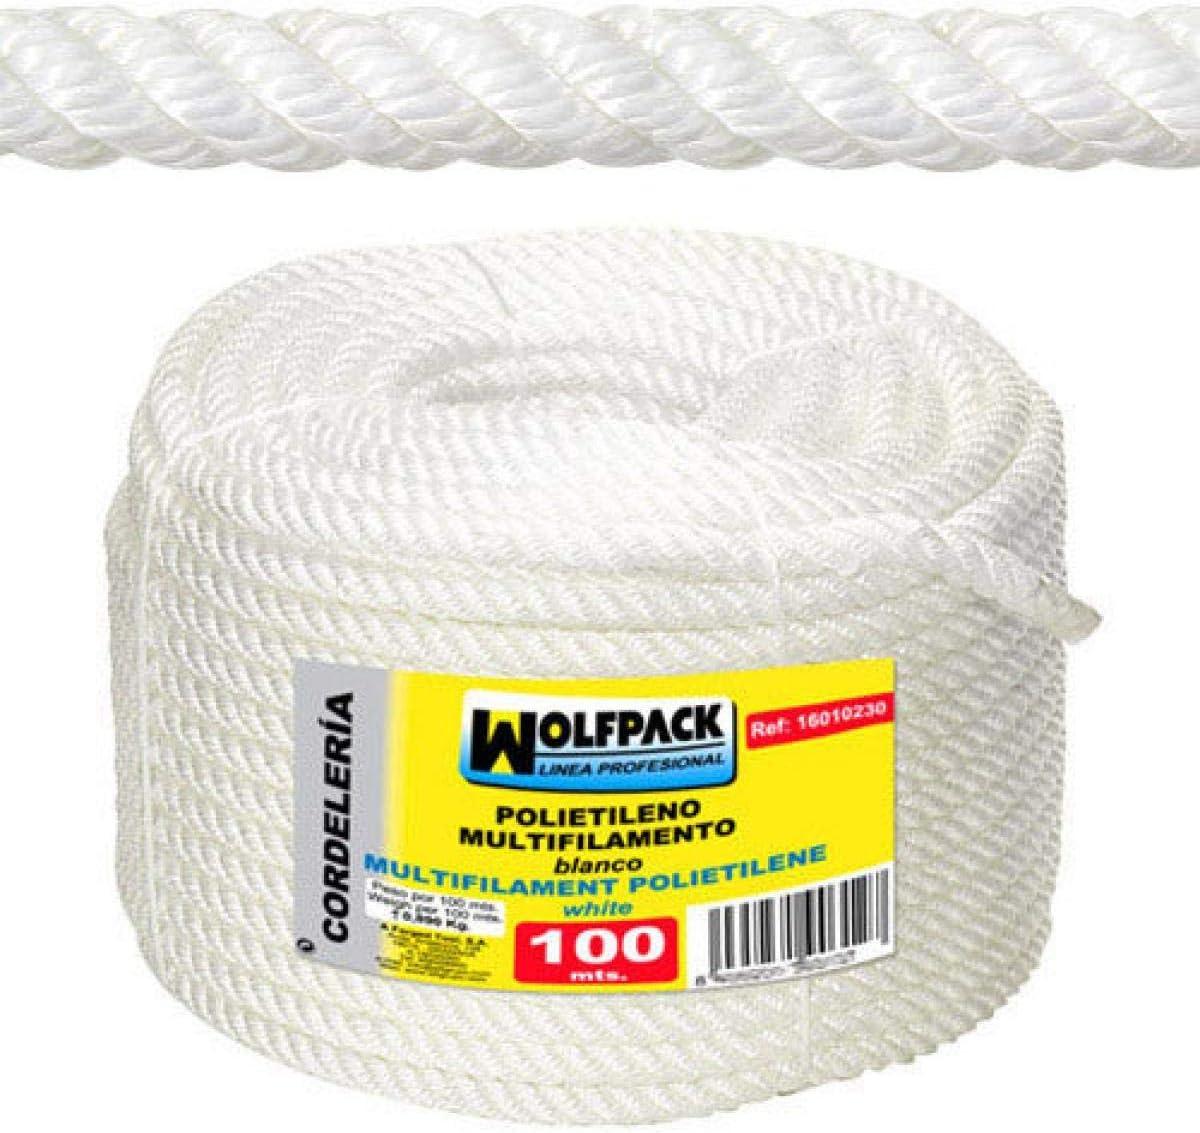 12/mm Wolfpack 16010220/Rope Polypropylene Multifilament Roll 100/MT